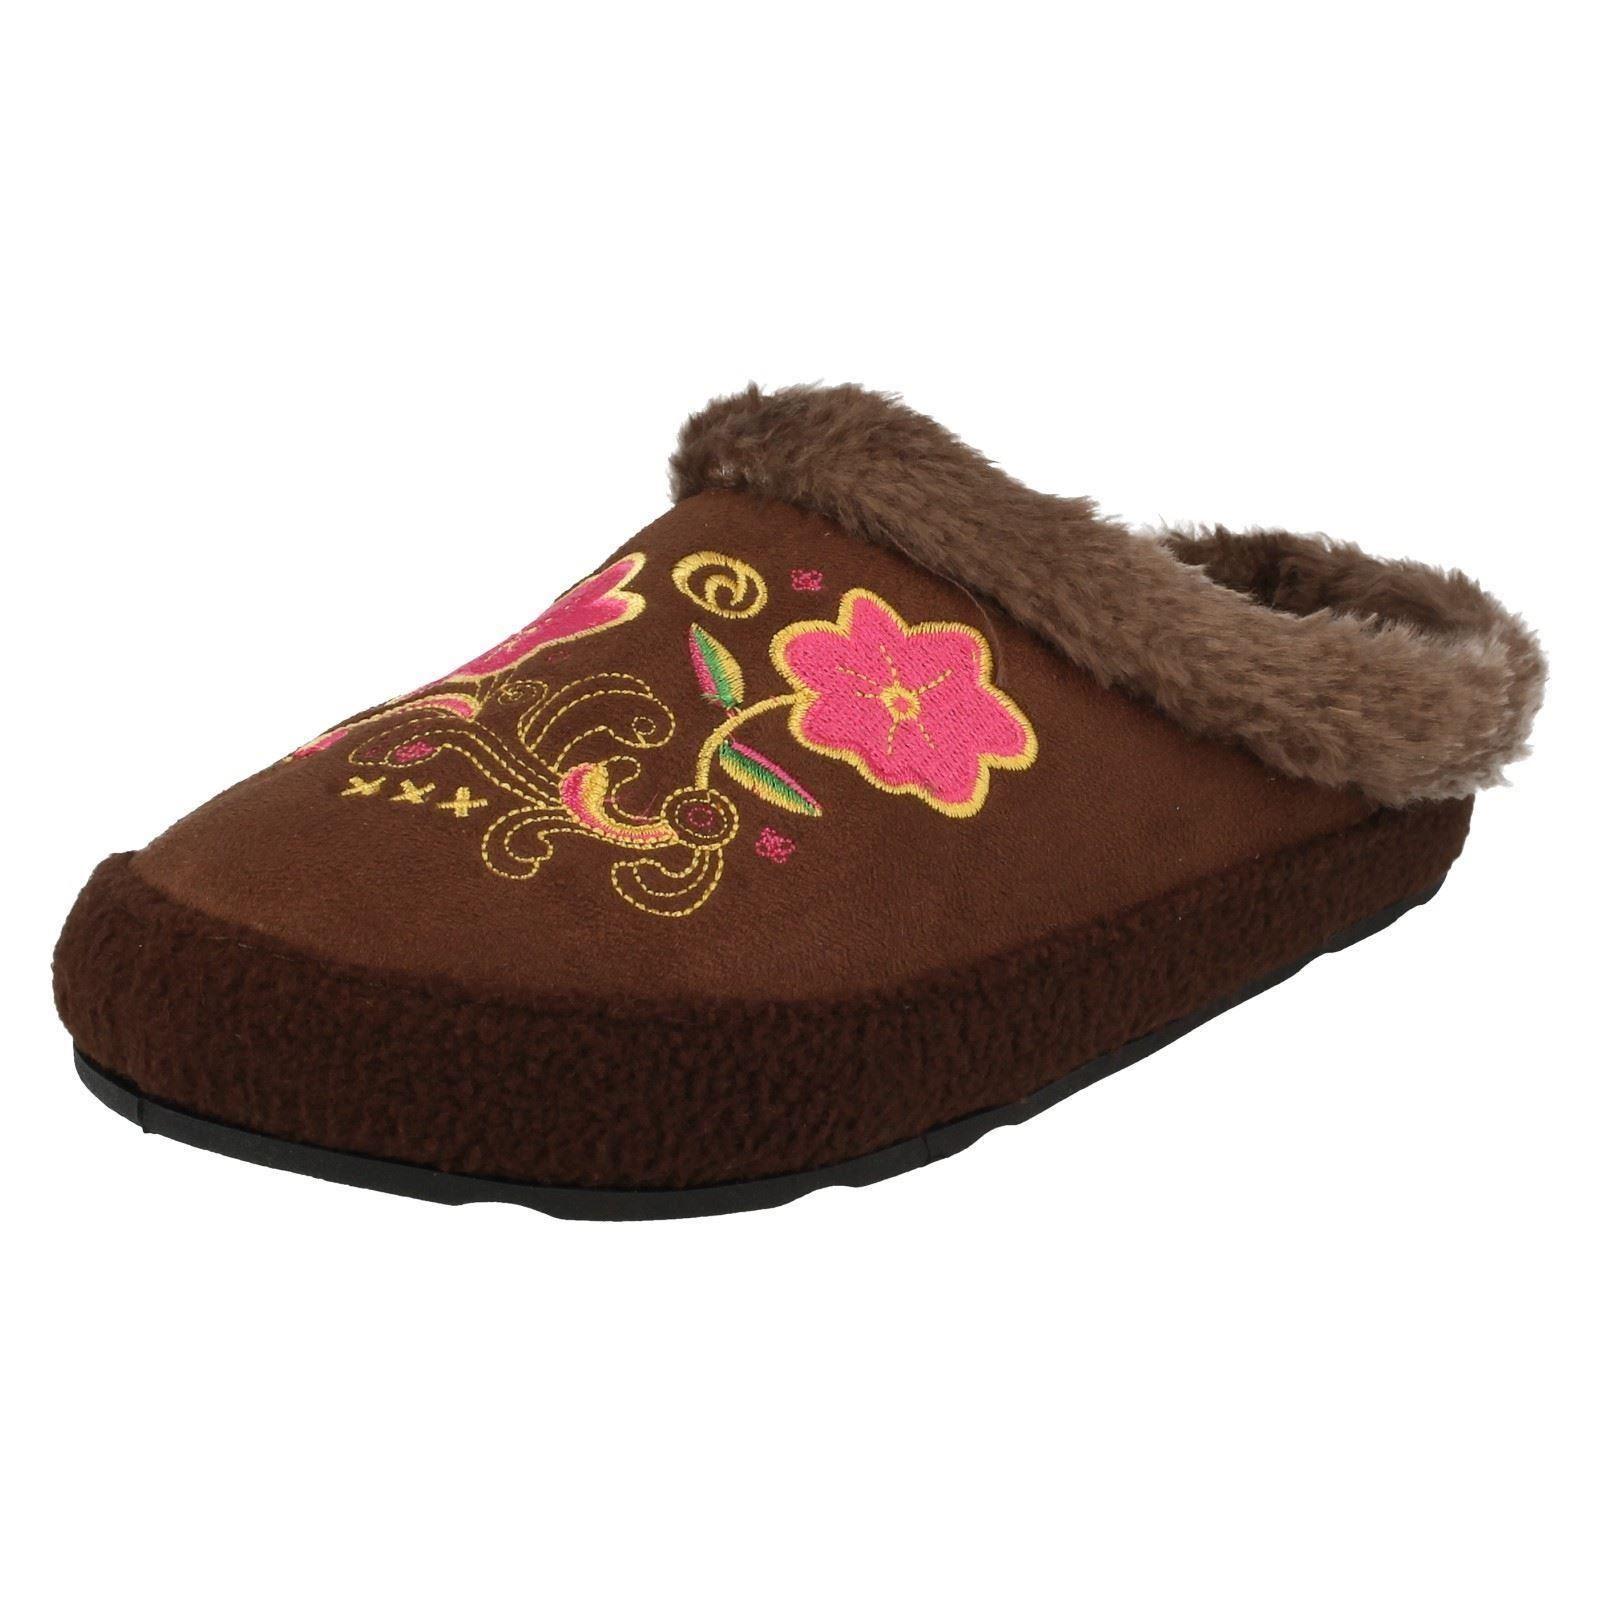 Rip Curl ladies Chocolat slipper mule  HOP